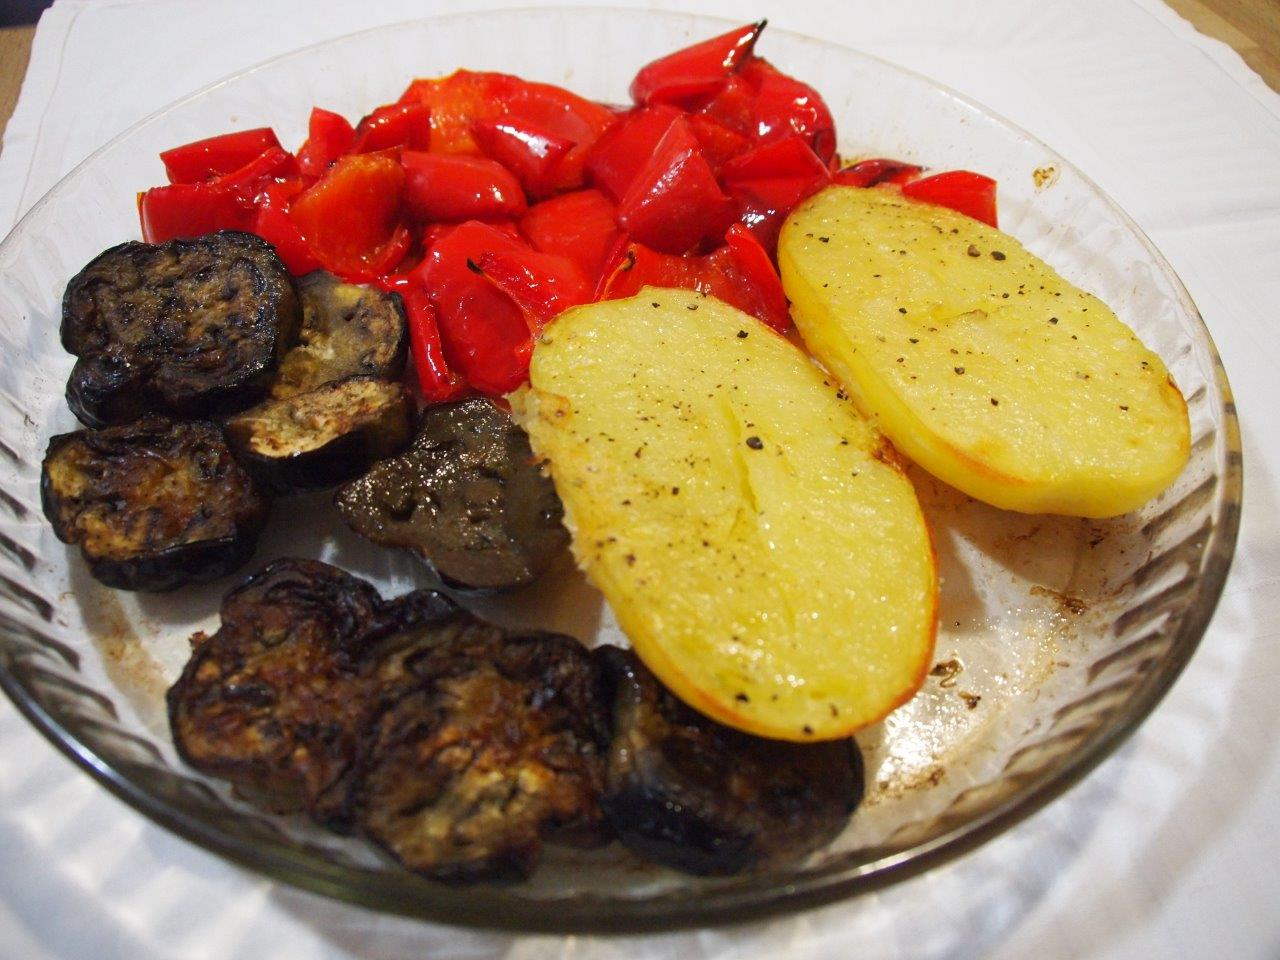 Verduras al horno con queso de cabra cocina sin carn - Verduras rellenas al horno ...